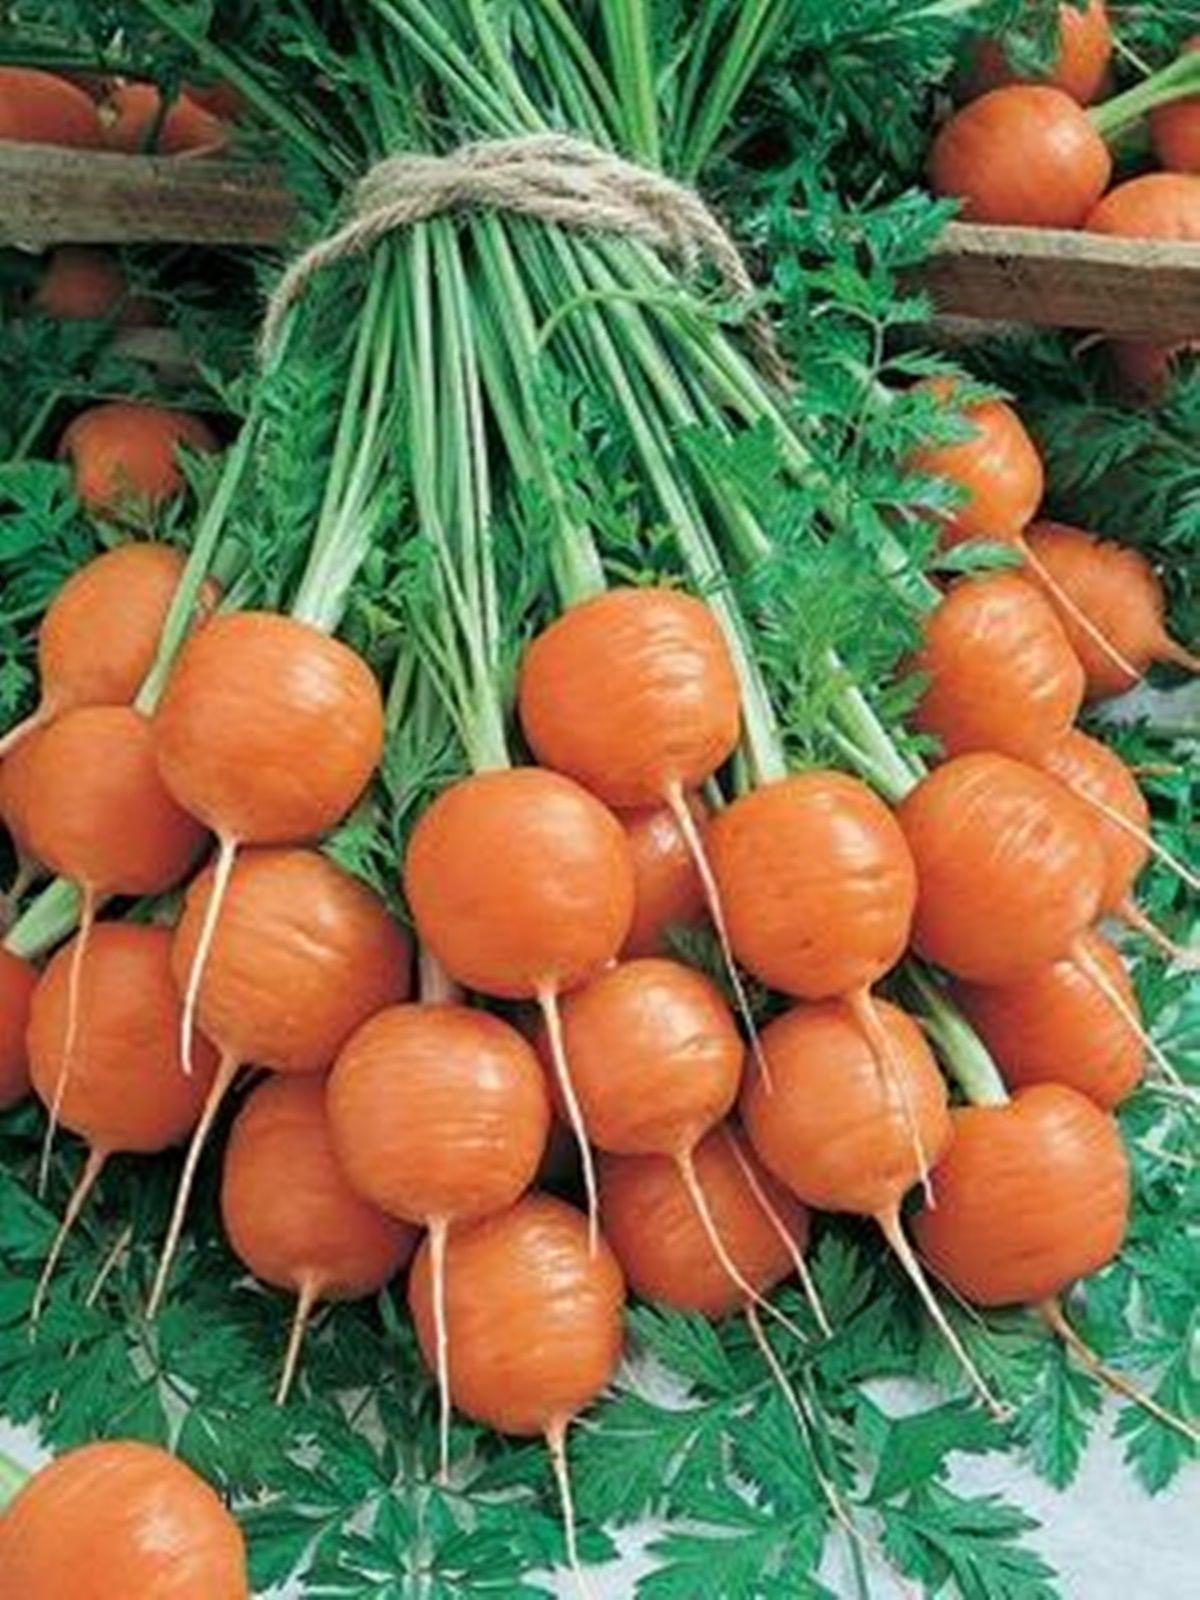 Sweet Carrots Parizhskiy Ryok-Paris Market Organic Heirloom Vegetable